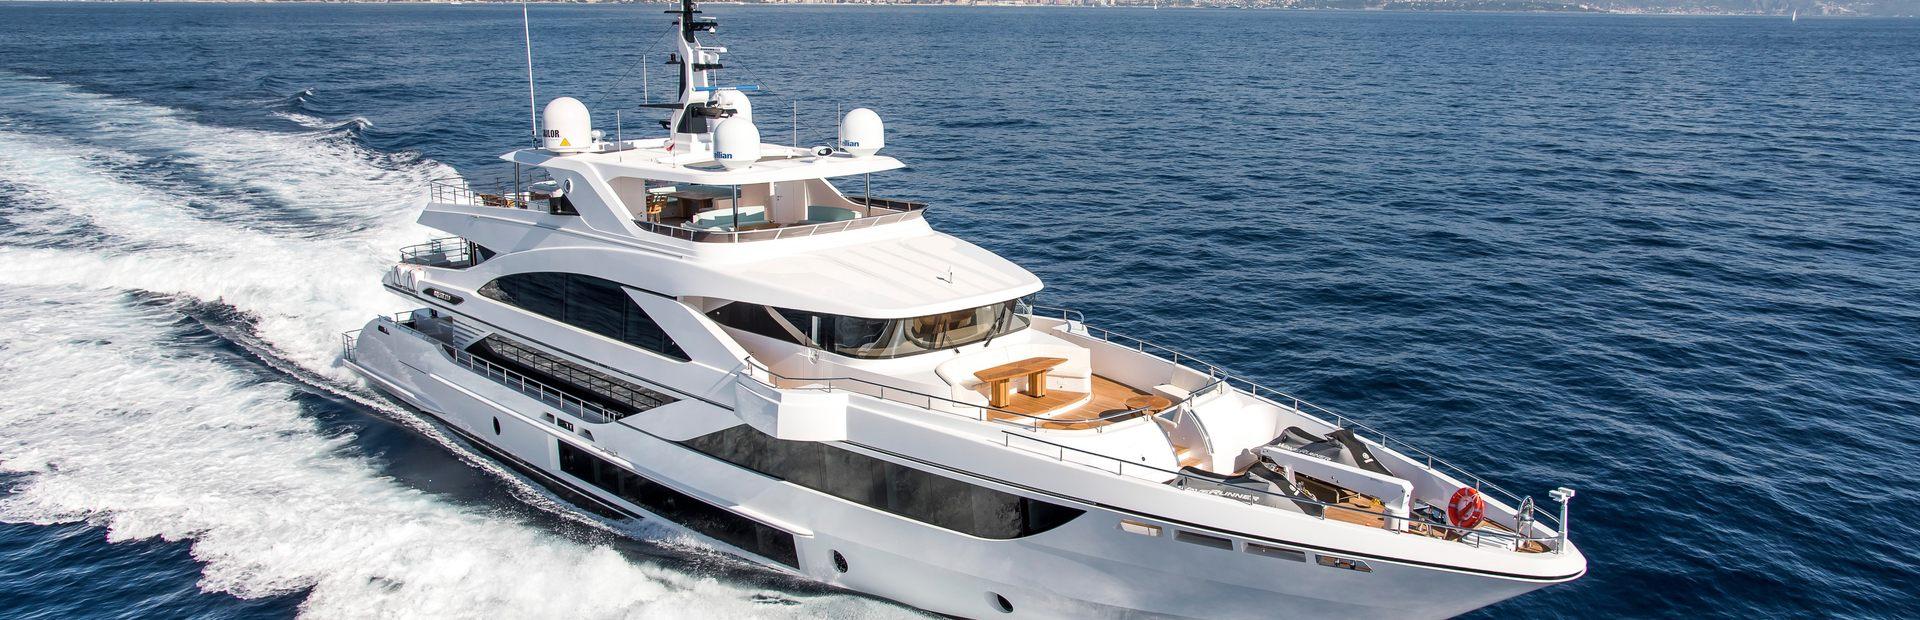 Majesty 140 Yacht Charter